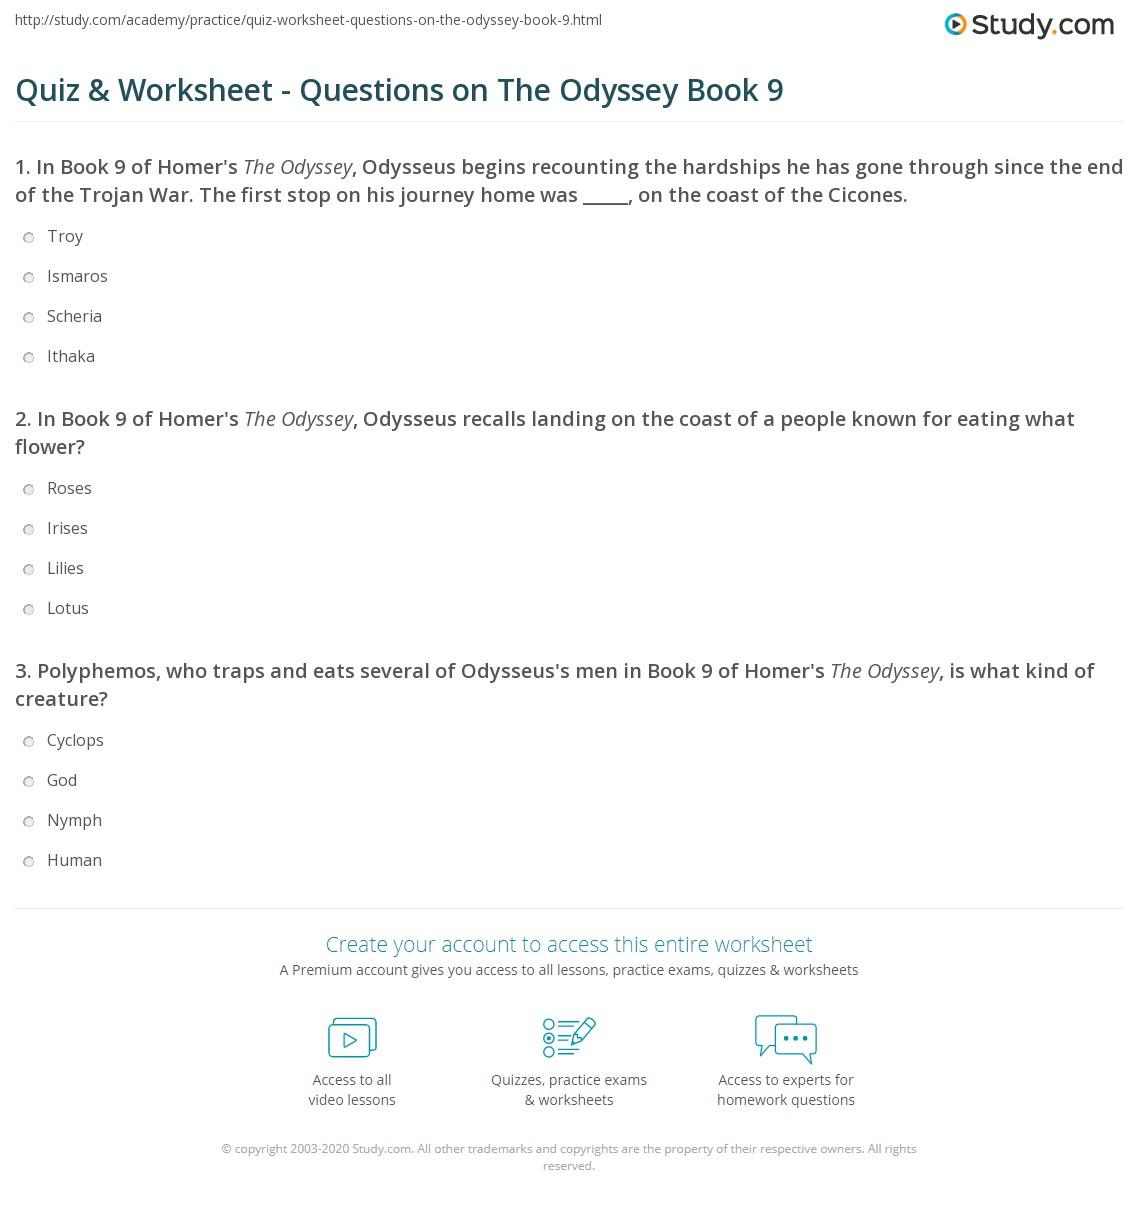 quiz worksheet questions on the odyssey book 9. Black Bedroom Furniture Sets. Home Design Ideas